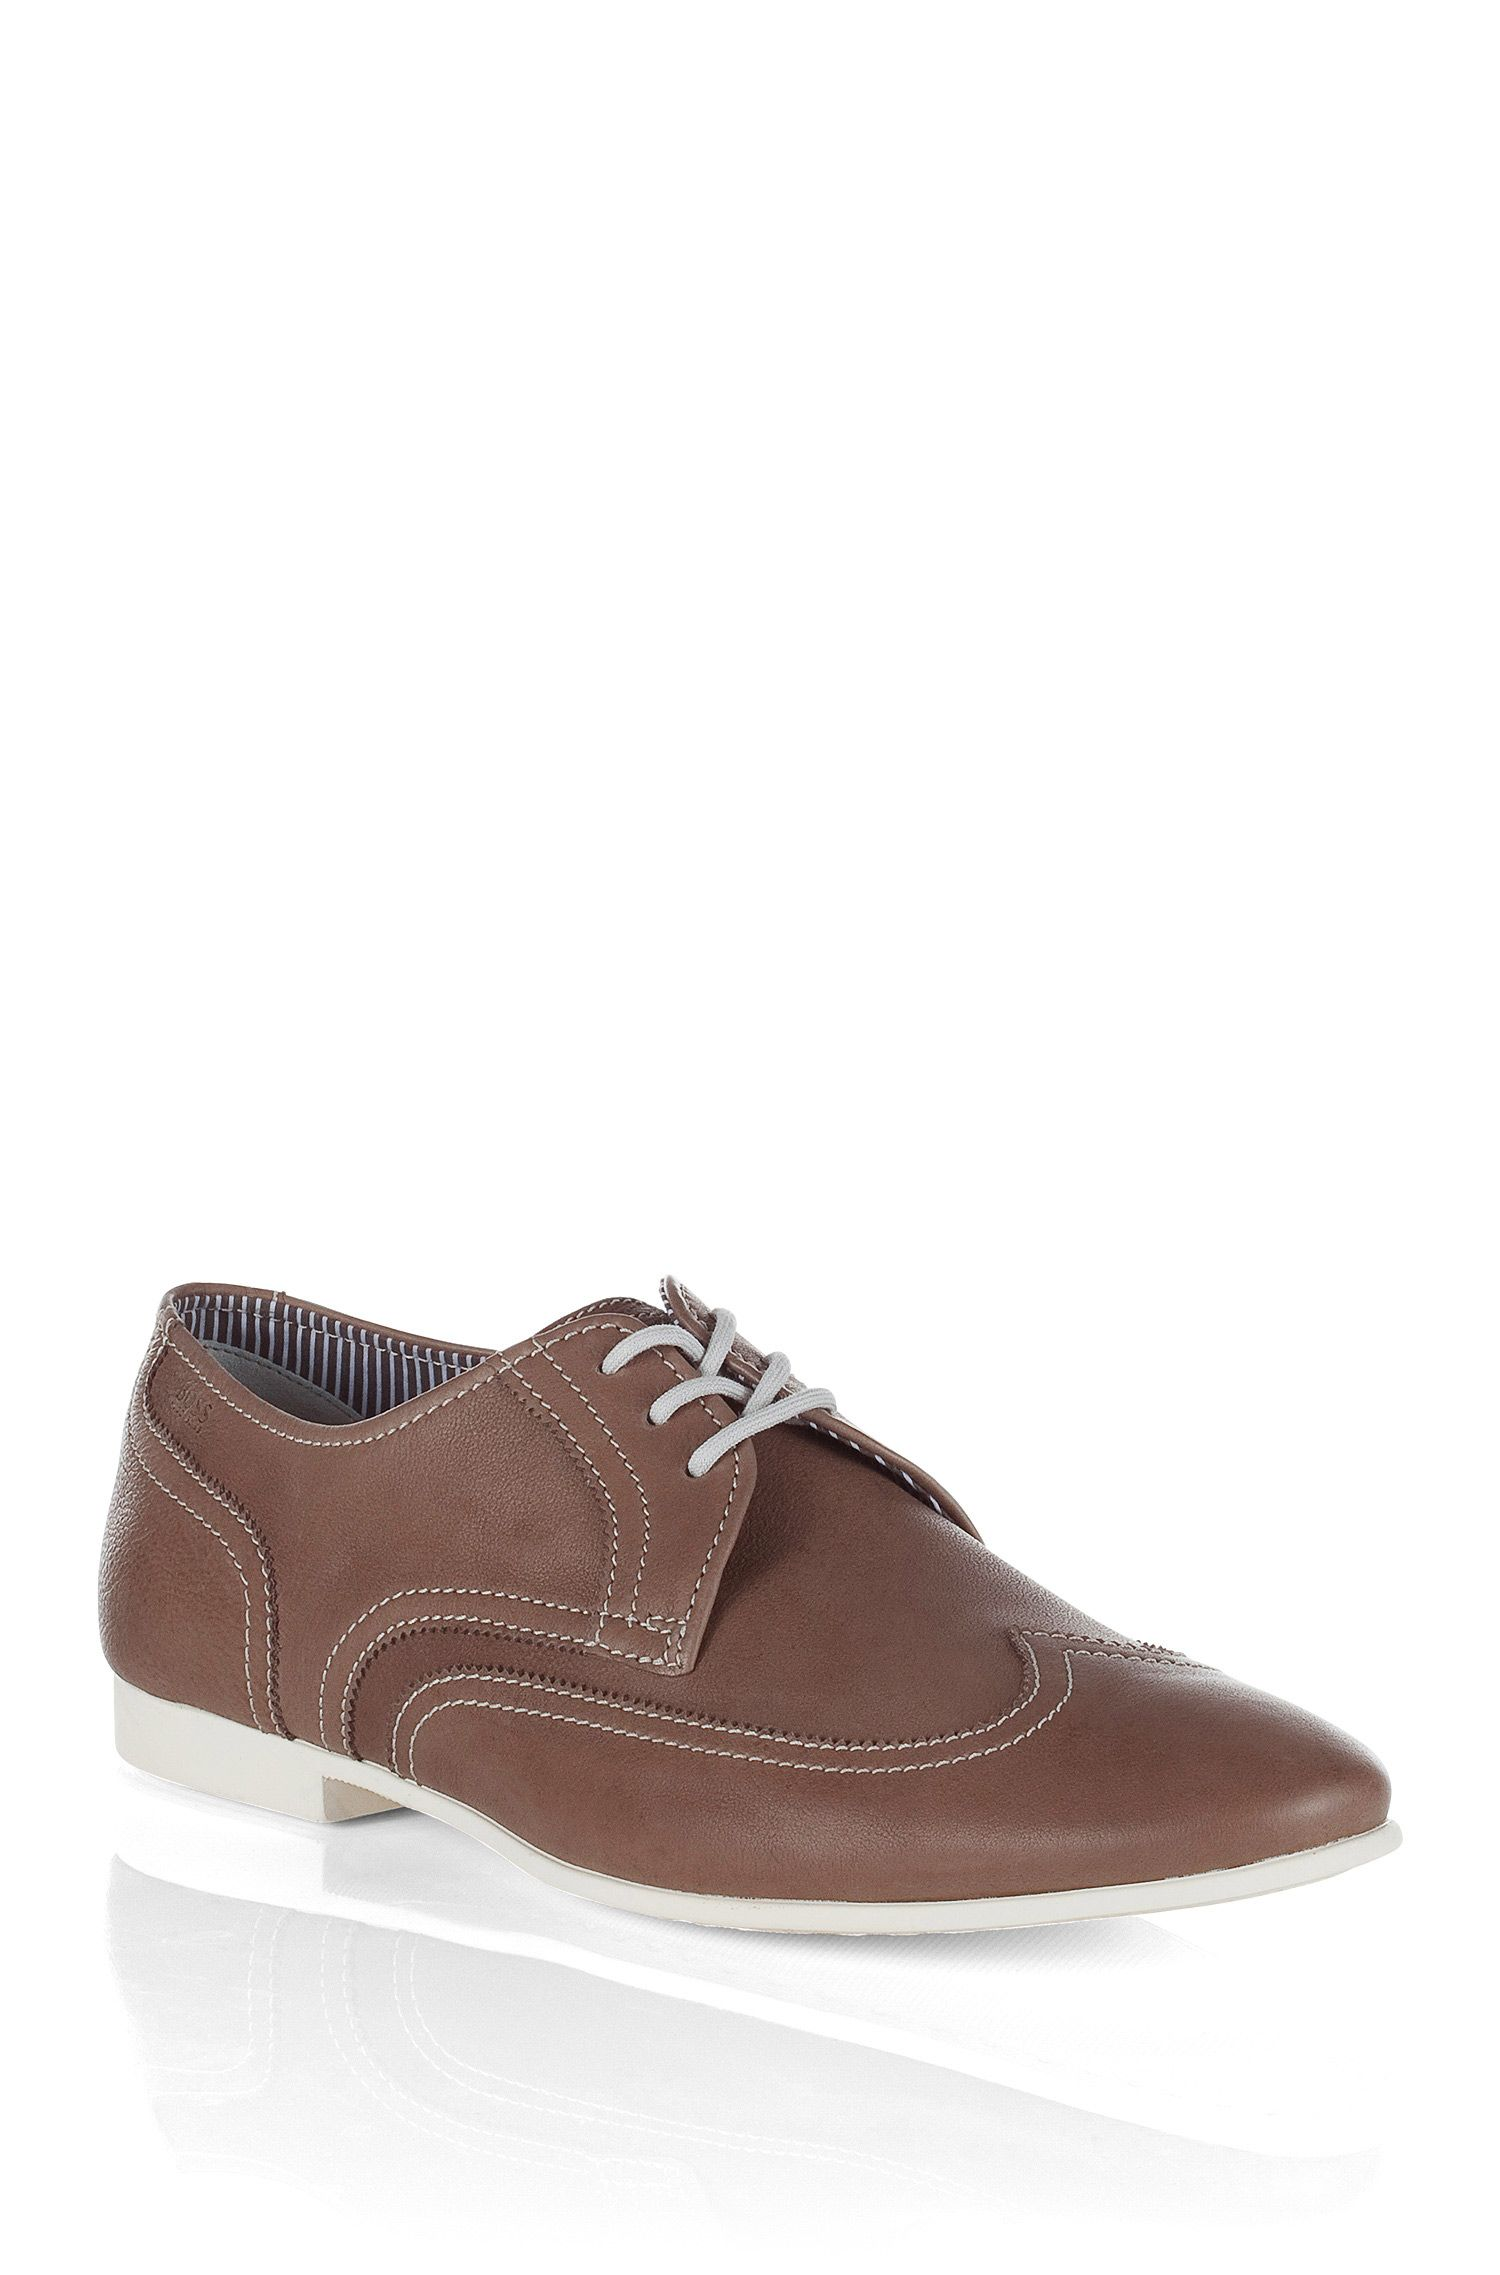 Chaussures Derby à bout golf, Ammio